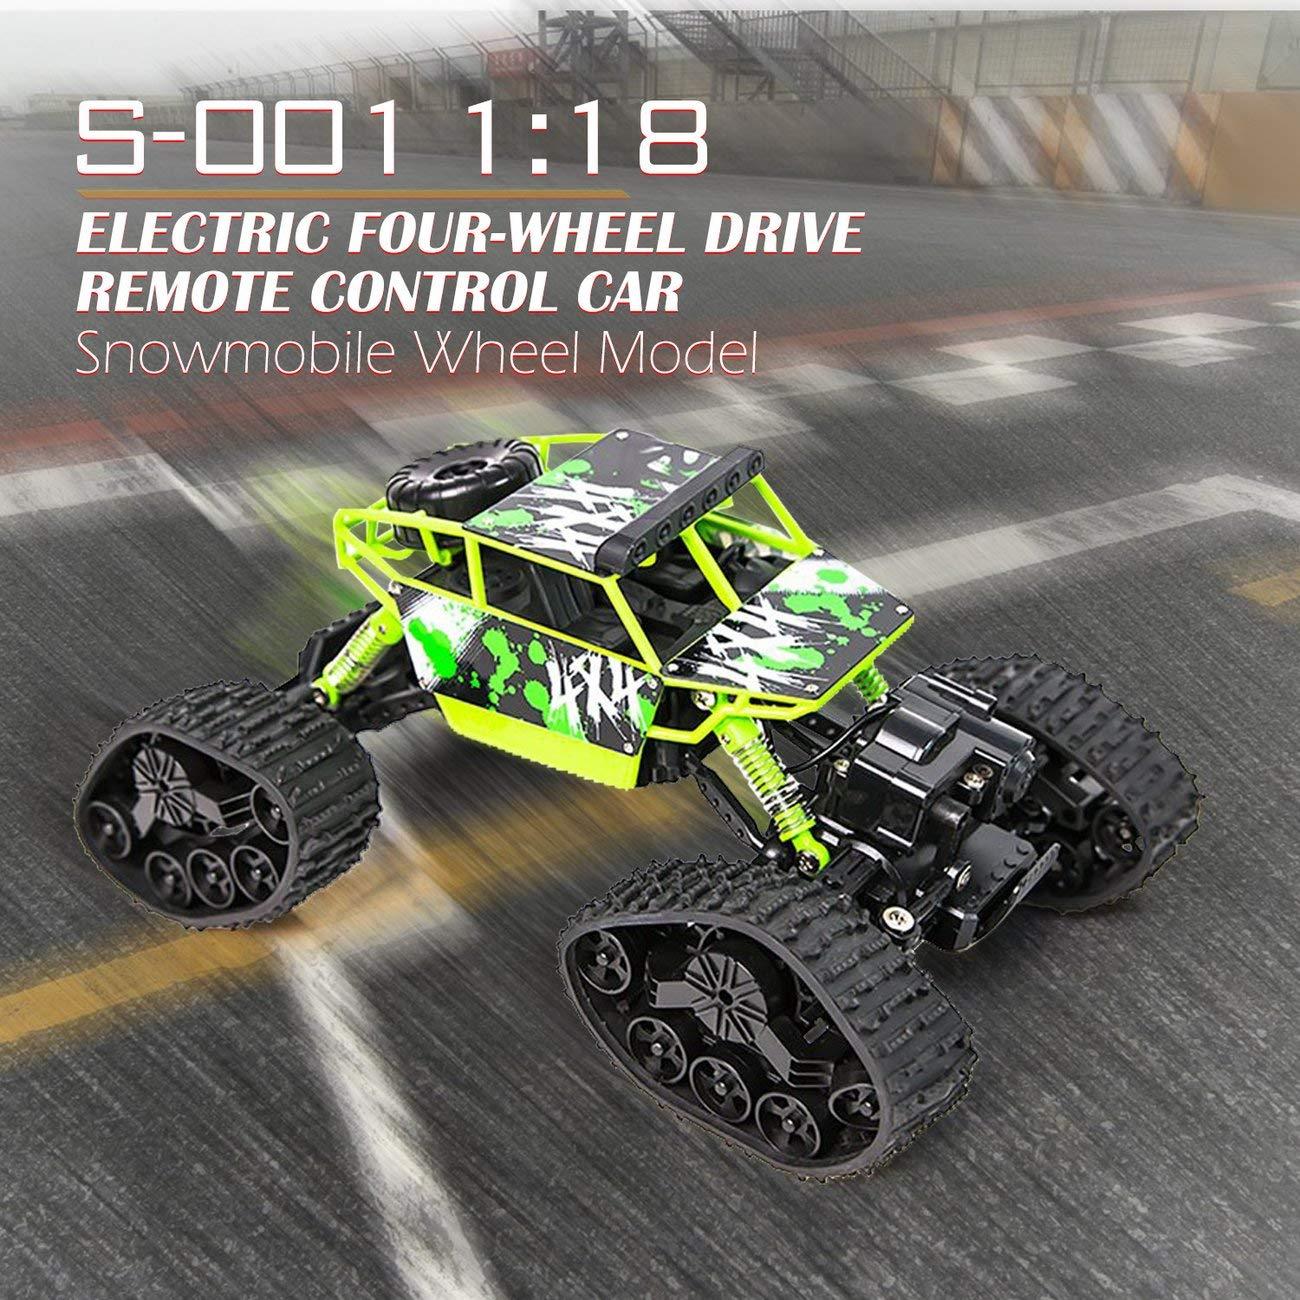 LasVogos LasVogos LasVogos 1 bis 18 elektrische Allradantrieb Snowmobile Rad Modell Fernbedienung Auto (Farbe: grün) 33cf62